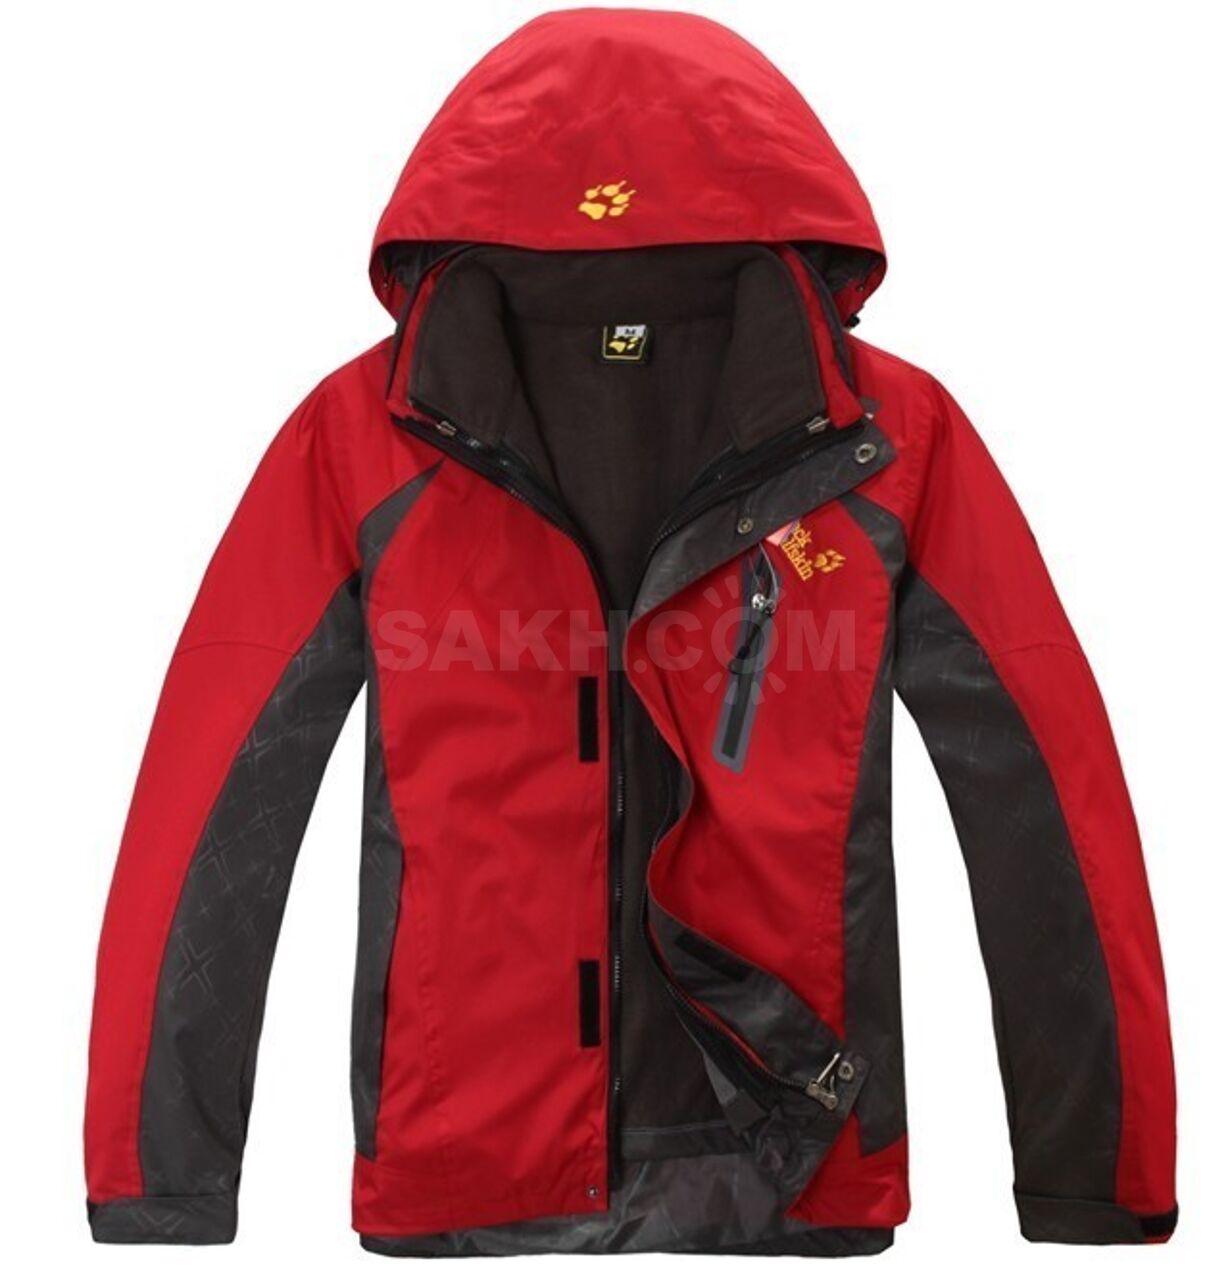 Jack Wolfskin Куртки мужские 3 in 1 Gore Tex - 6000 руб. Одежда ... 41729be1e69